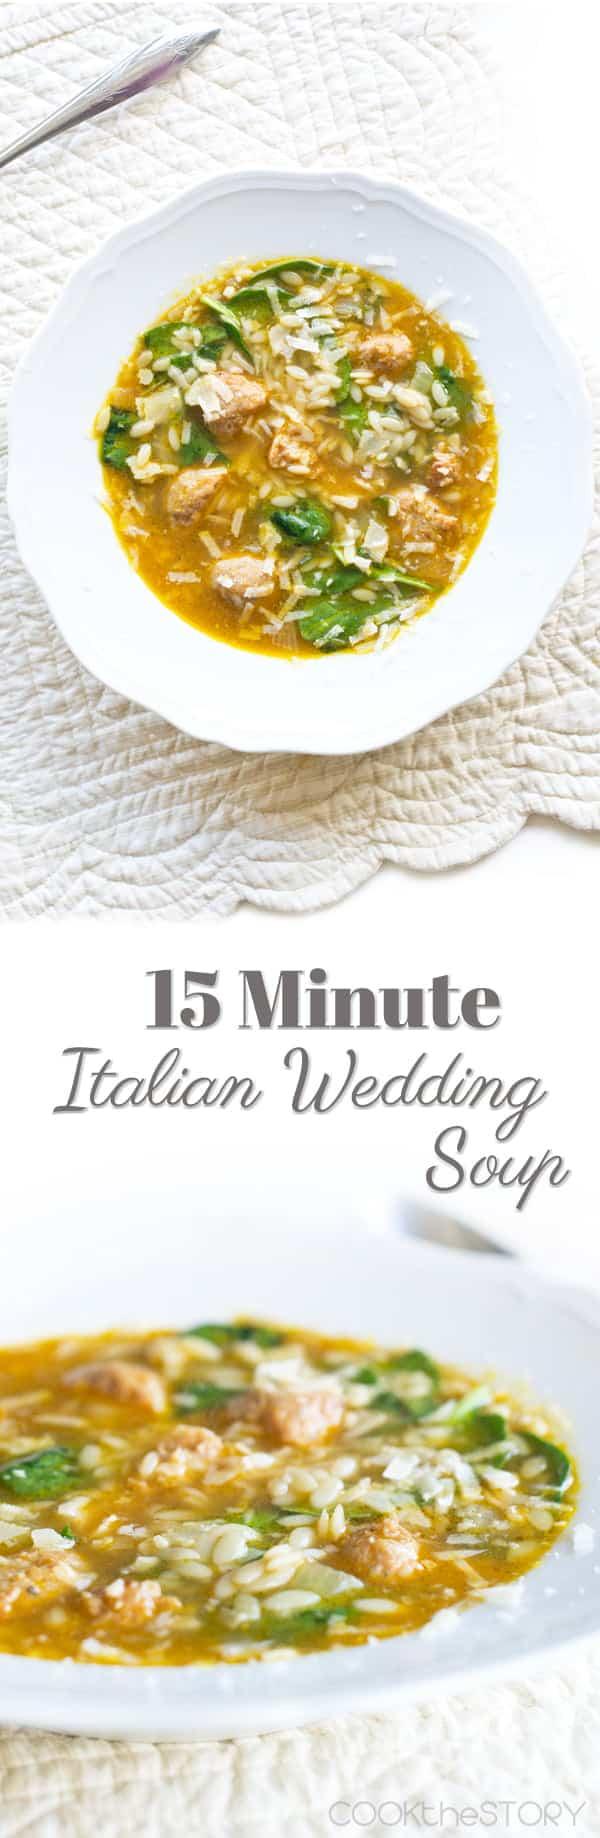 Italian Wedding Soup Spinach